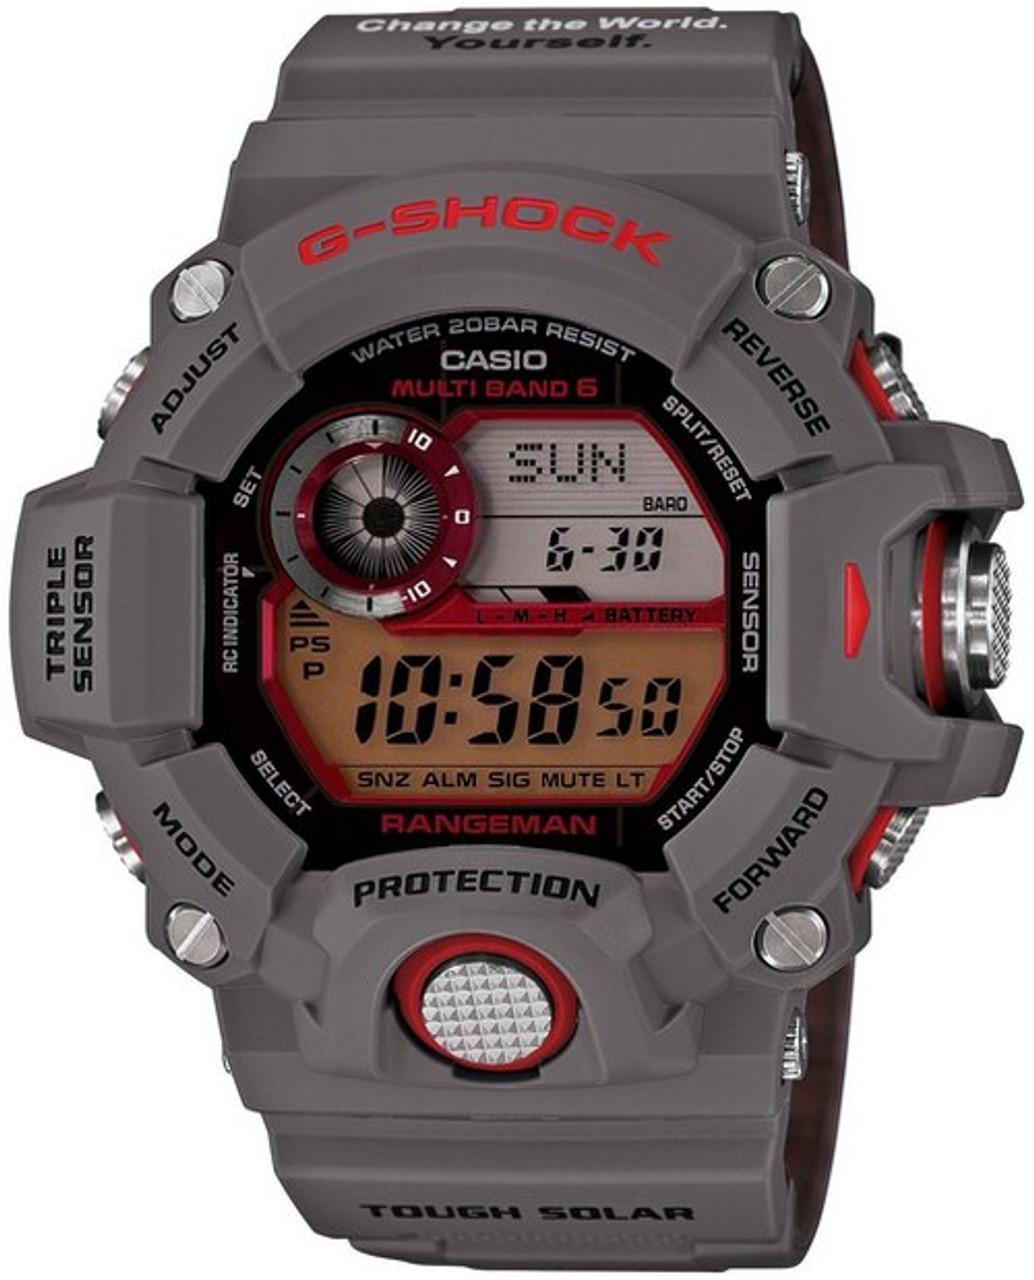 Casio G-Shock Rangeman GW-9400KJ-8JR Earthwatch